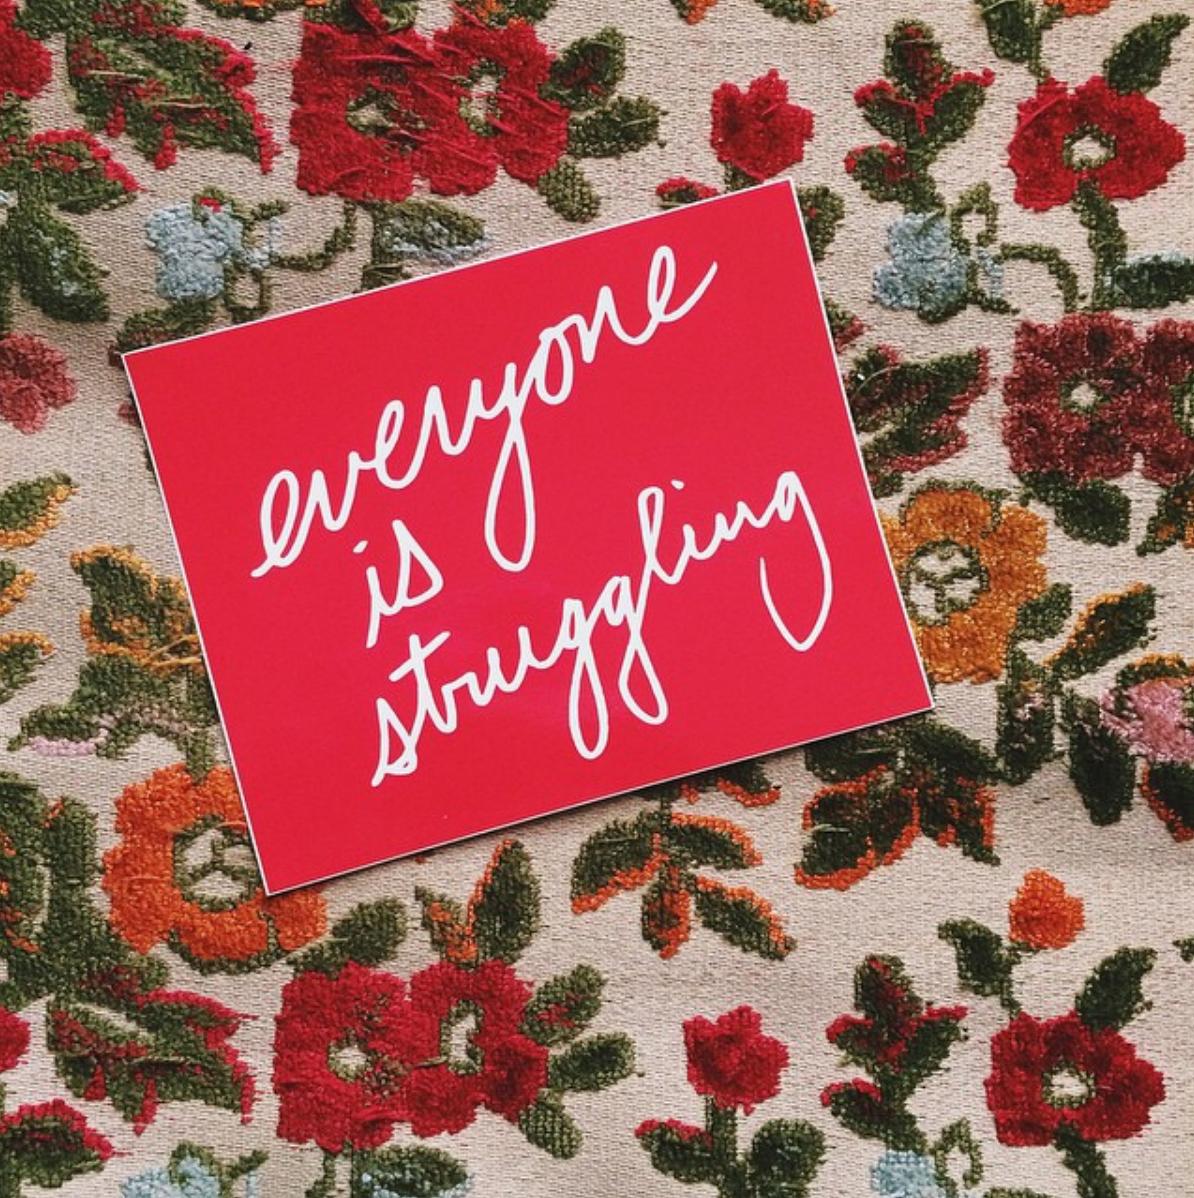 #1 - Everyone is struggling stickerOctober 2014